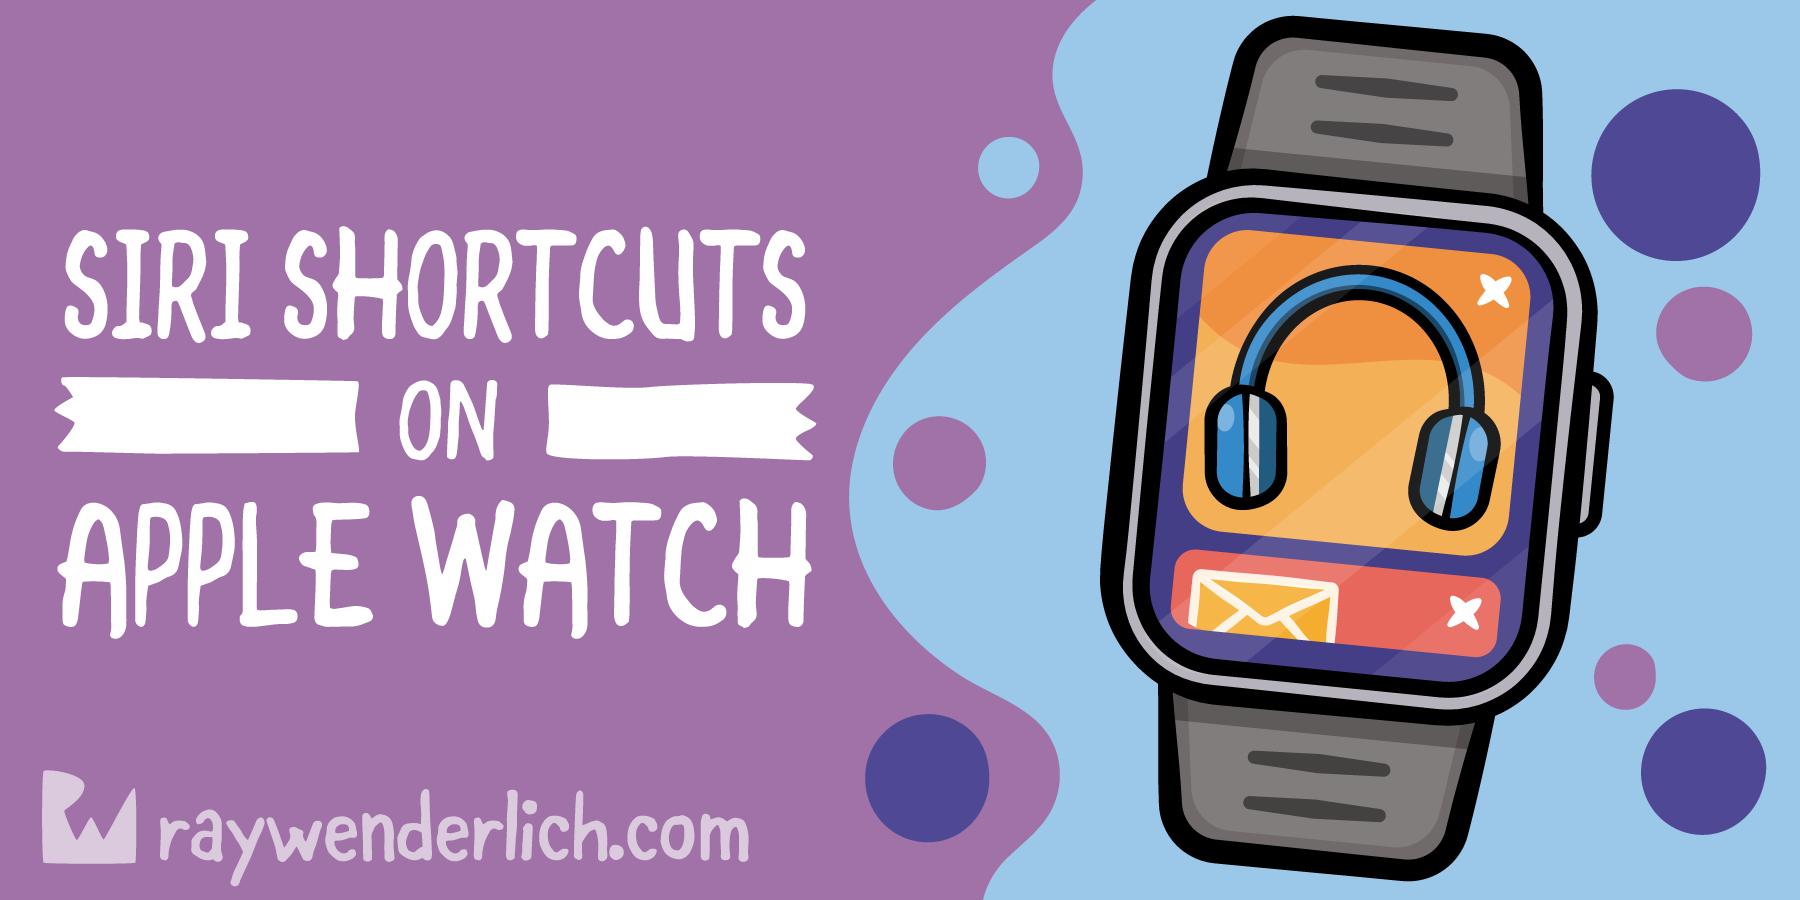 Siri Shortcuts on Apple Watch [FREE]